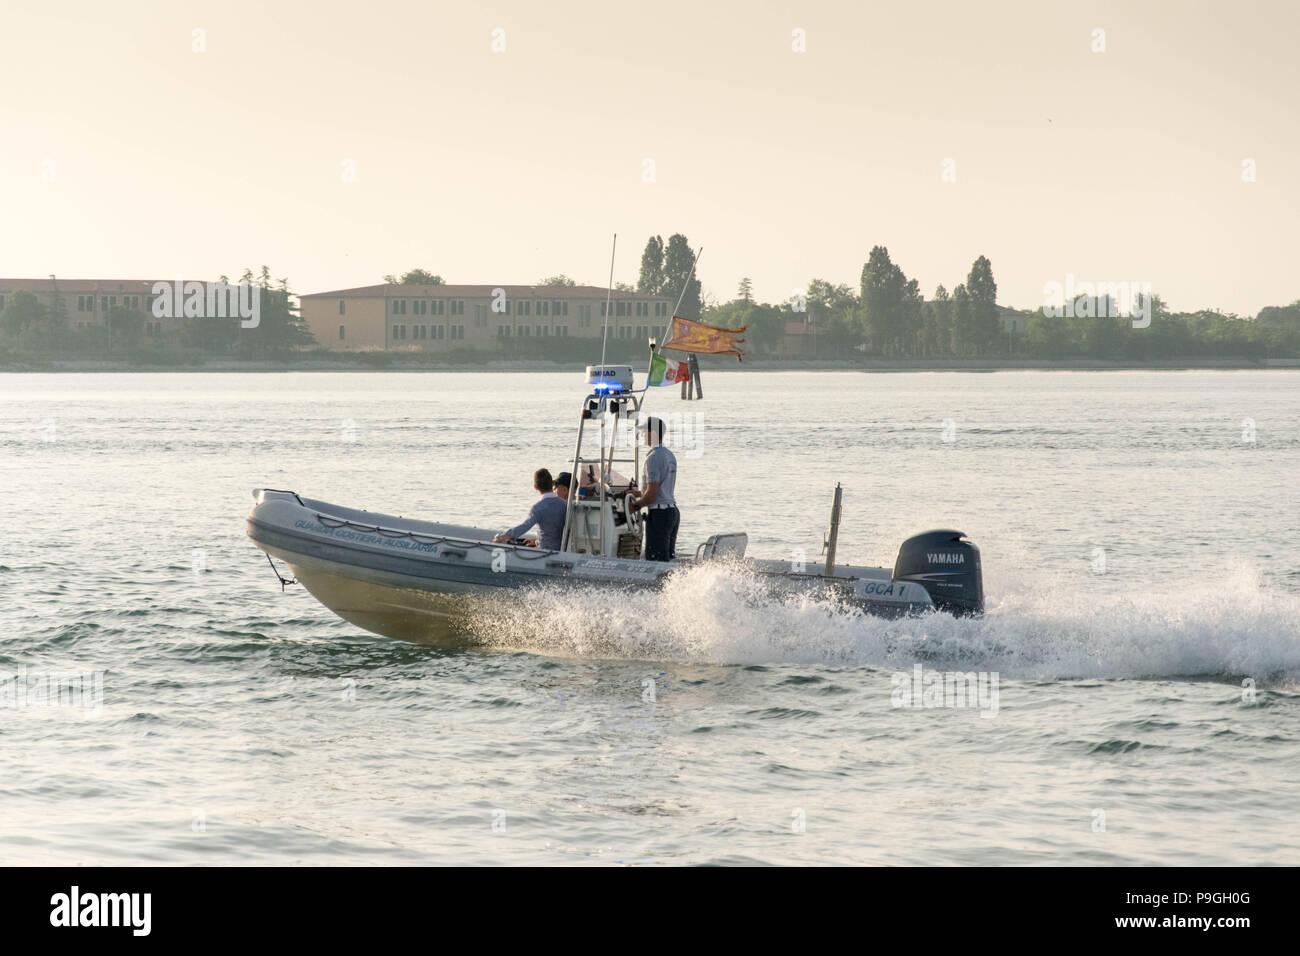 Europe, Italy, Veneto, Venice. Italian Coast Guard (Guardia Costiera) hybrid boat responding with lights and sirens. Lagune di Venezia. - Stock Image